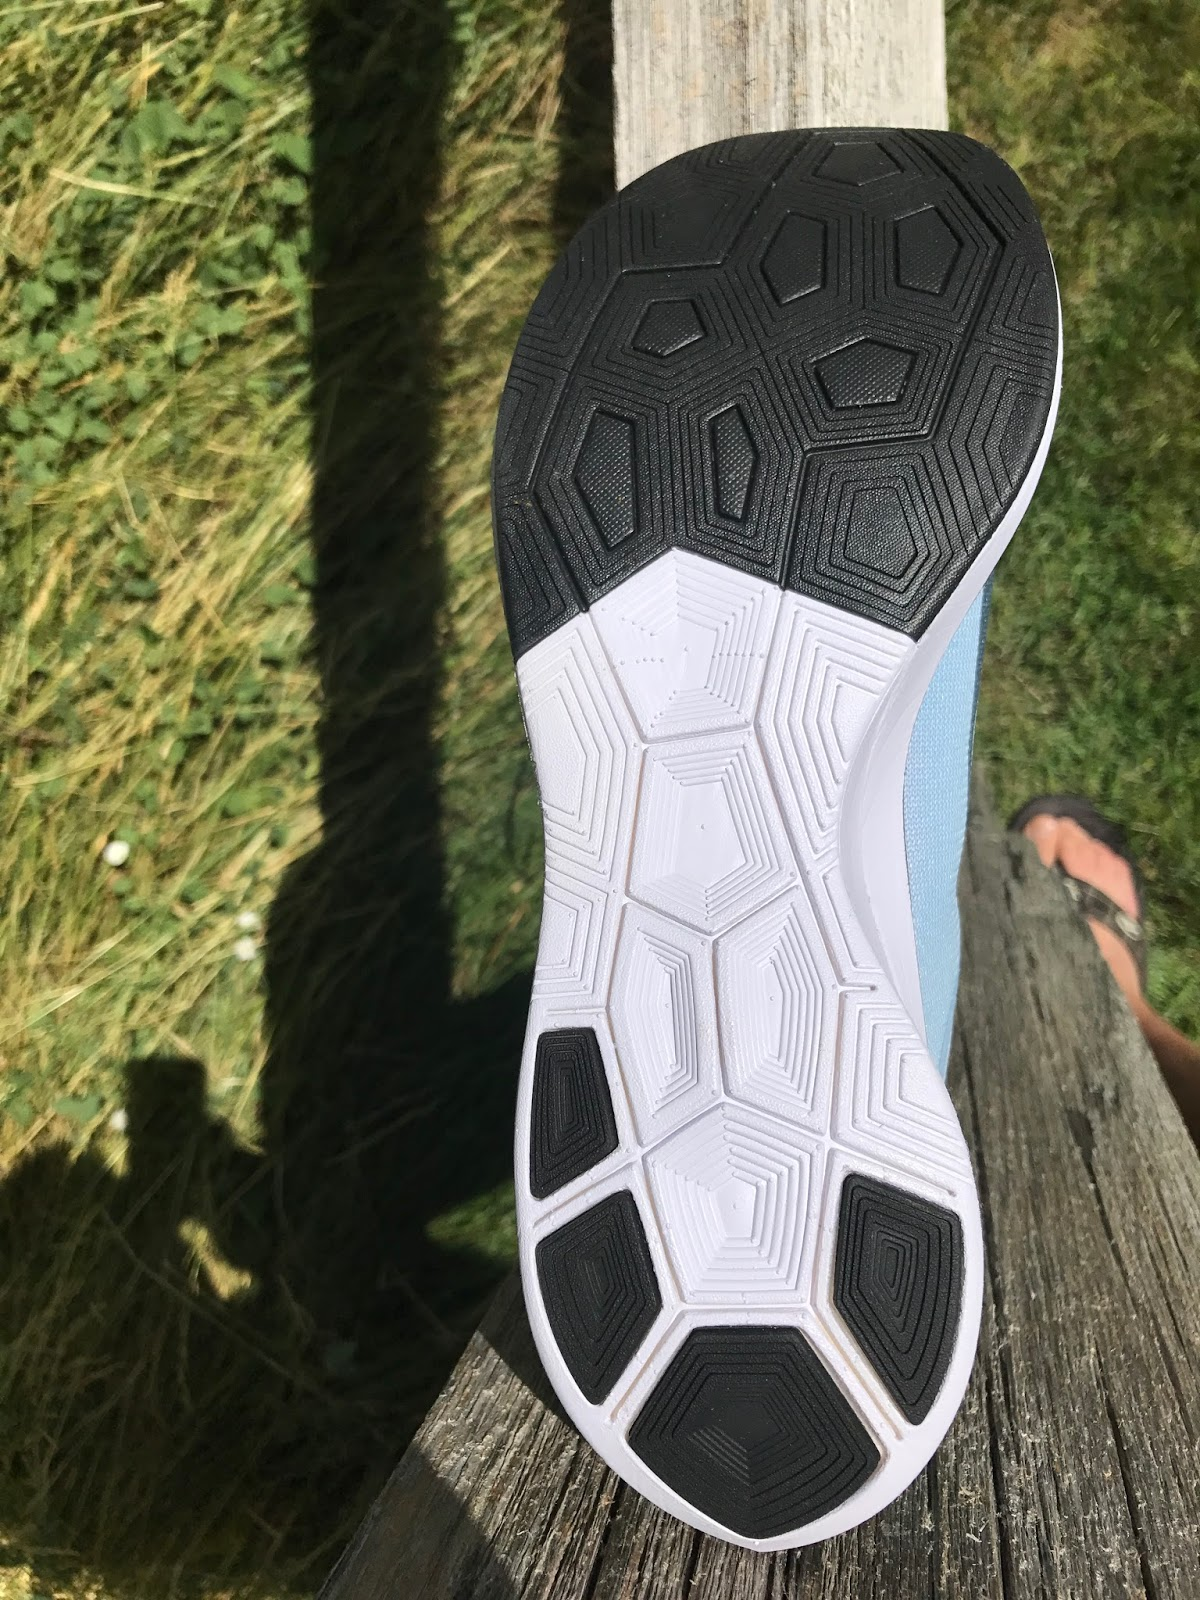 de1ffb999f21c Road Trail Run  Nike Zoom Vaporfly 4% Detailed Breakdown Run and ...